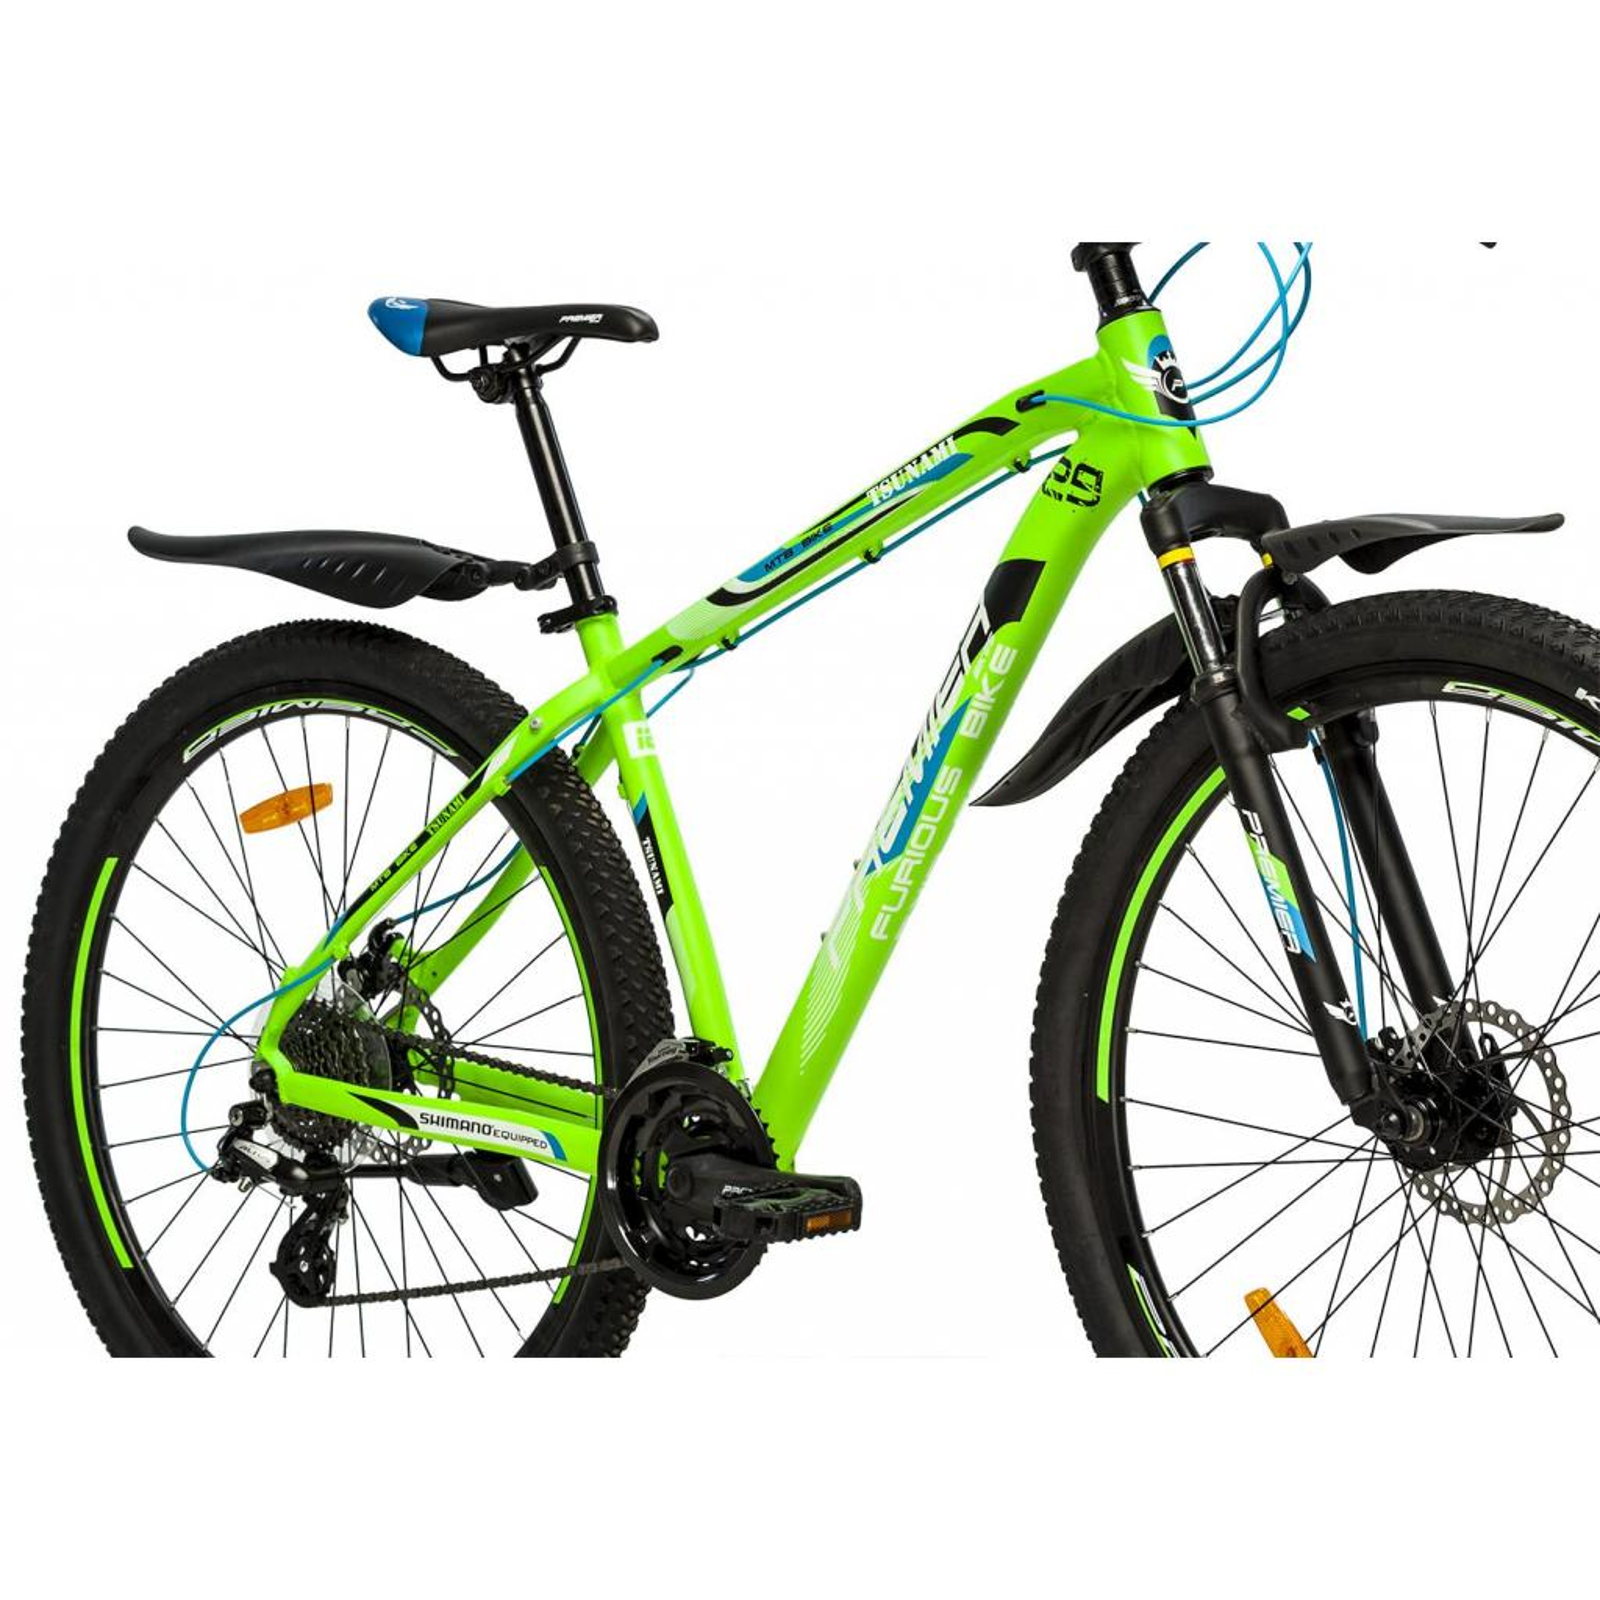 "Велосипед Premier Tsunami 29 Disc 17"" matt white (SP0001503) изображение 3"